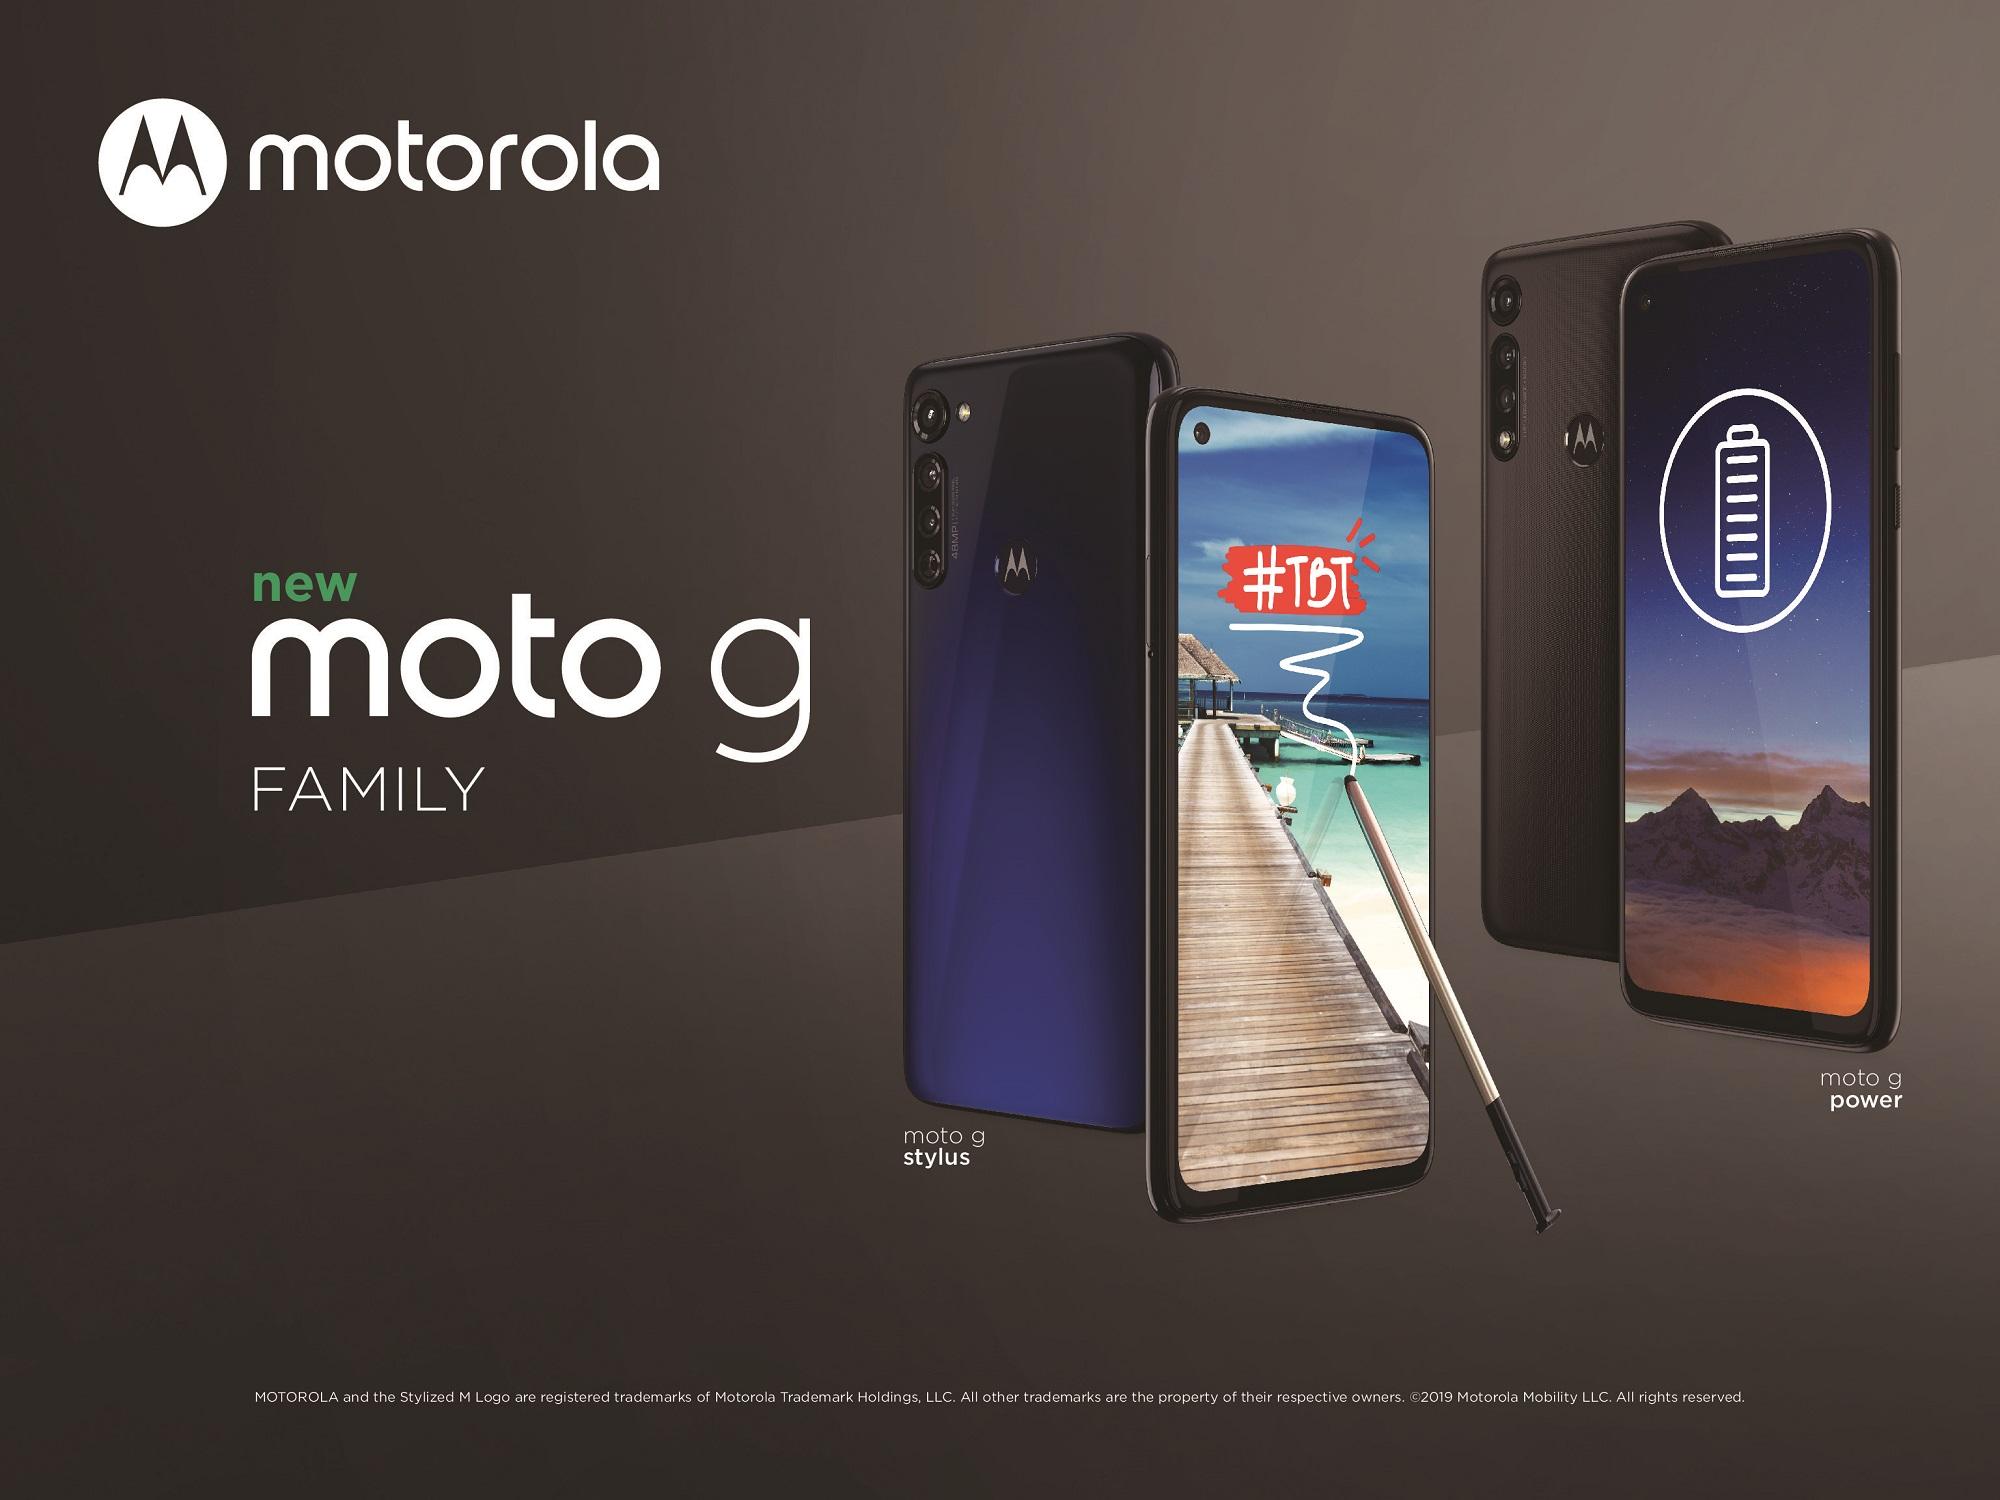 smartfon Motorola Moto G8 Power Motorola Moto G Stylus